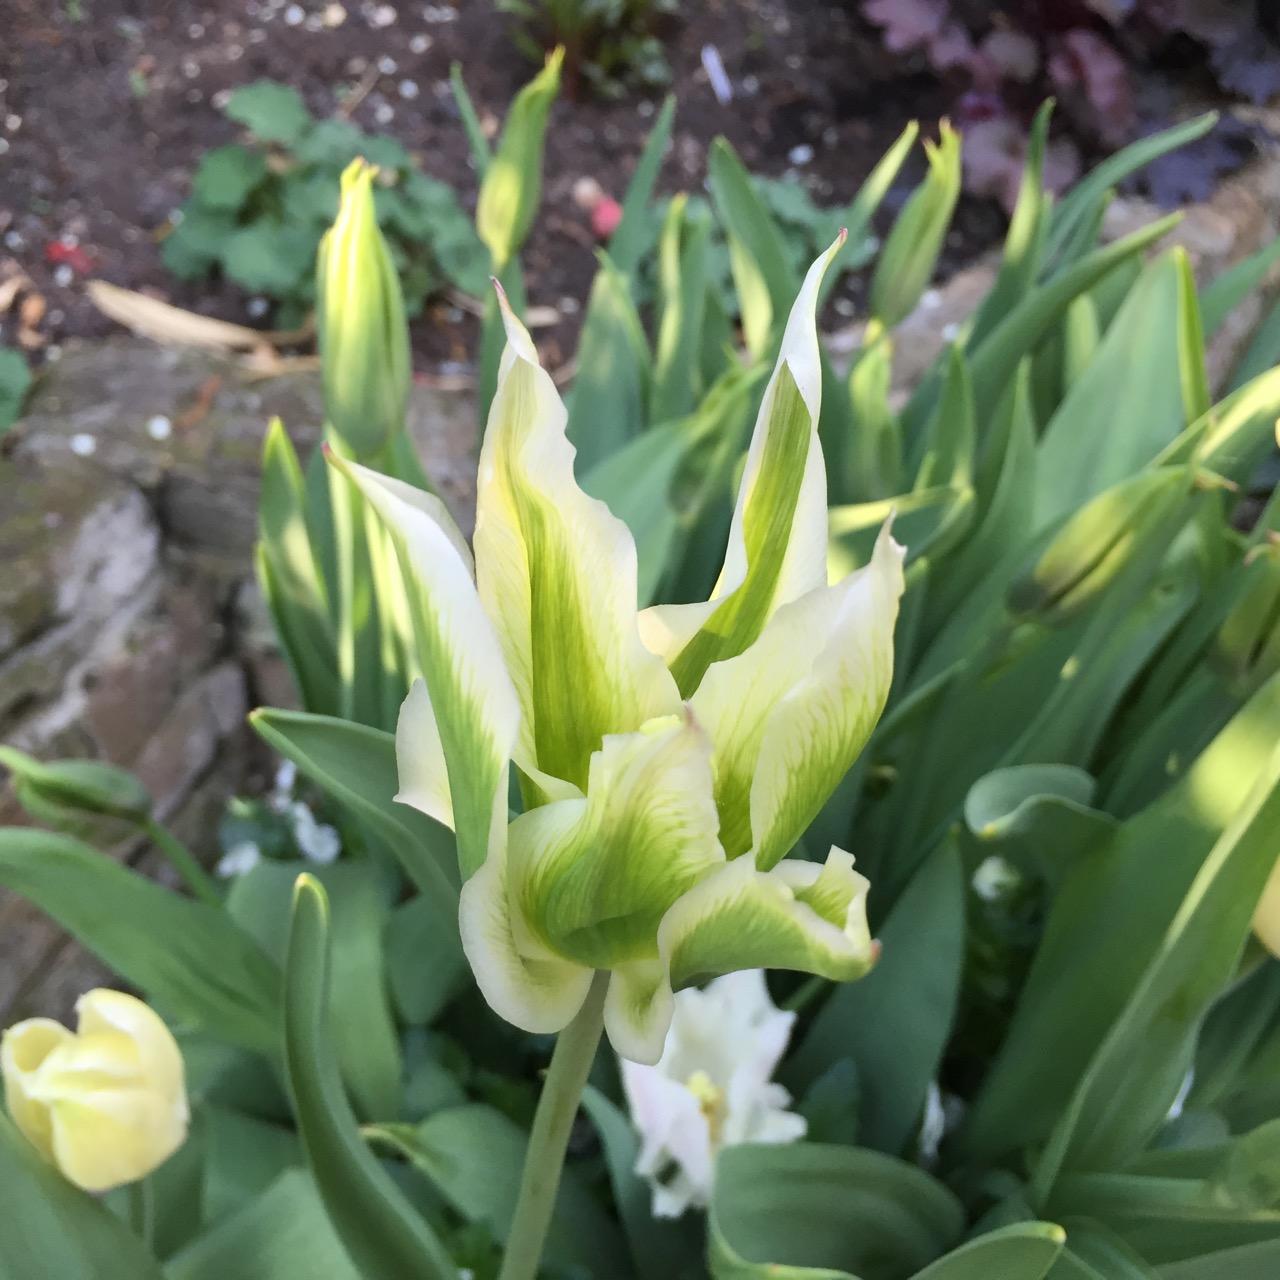 Tulipa 'Green Star'